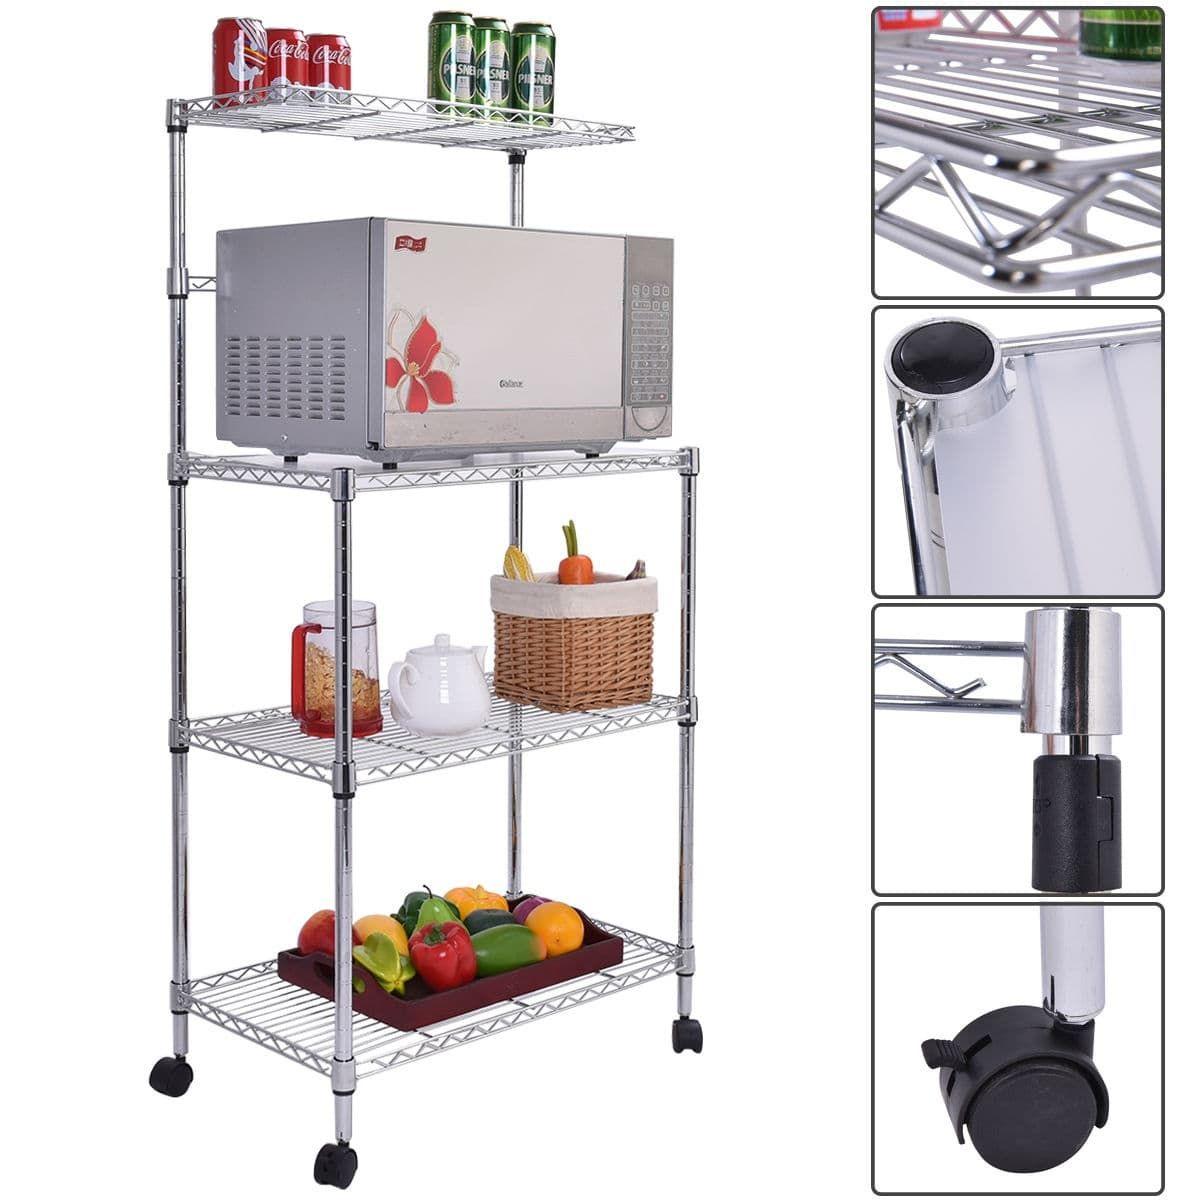 Costway 3 Tier Kitchen Baker S Rack Microwave Oven Stand Storage Cart Workstation Shelf Grey